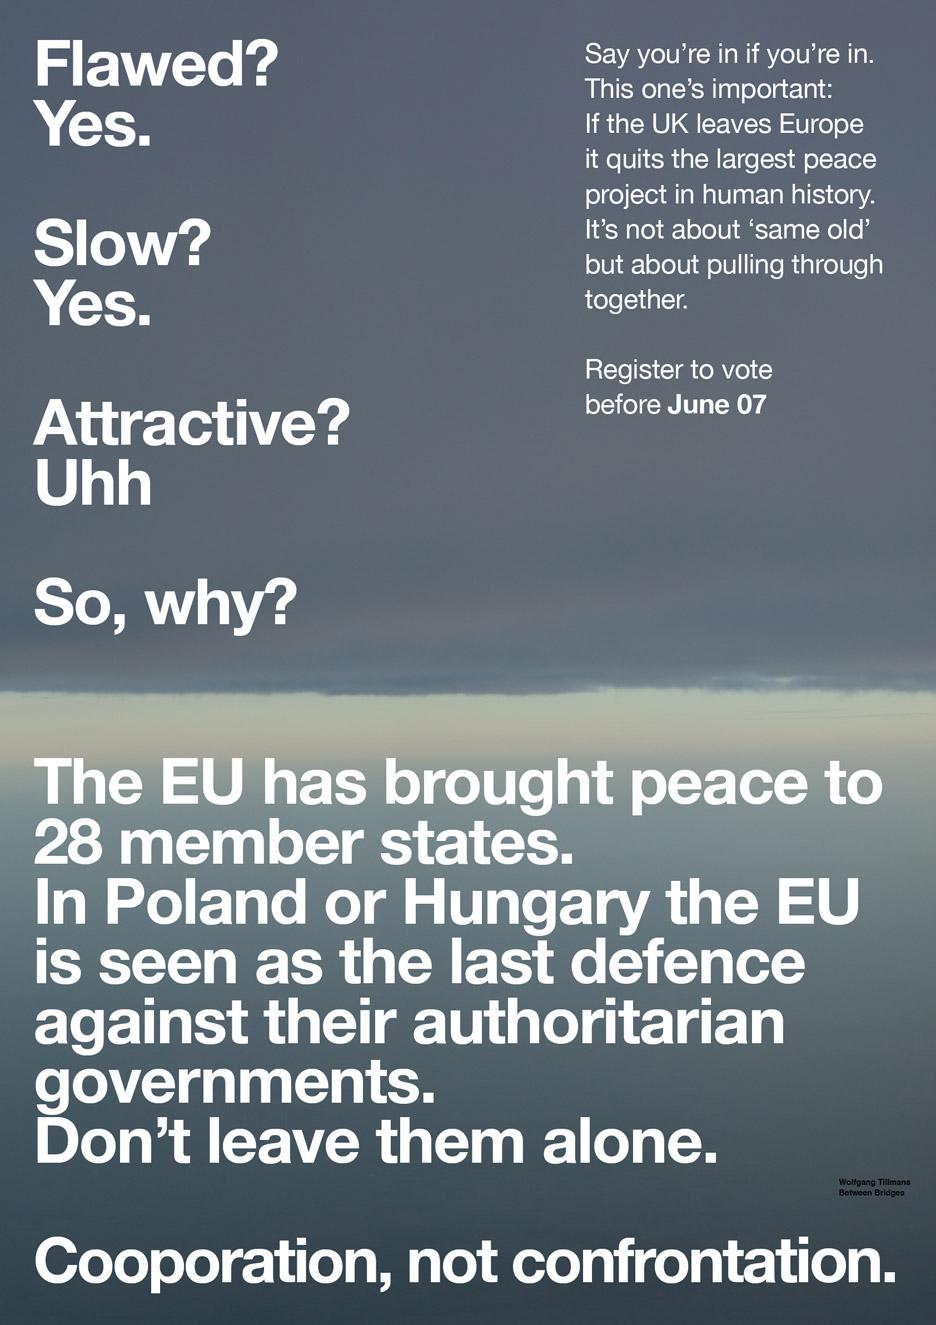 eu-referendum-remain-campaign-posters-by-wolfgang-tillmans_dezeen_936_7